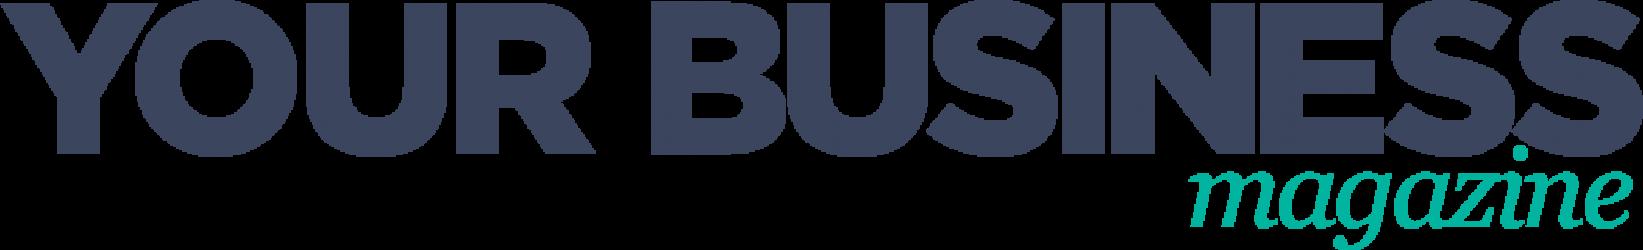 Your Business Magazine badge